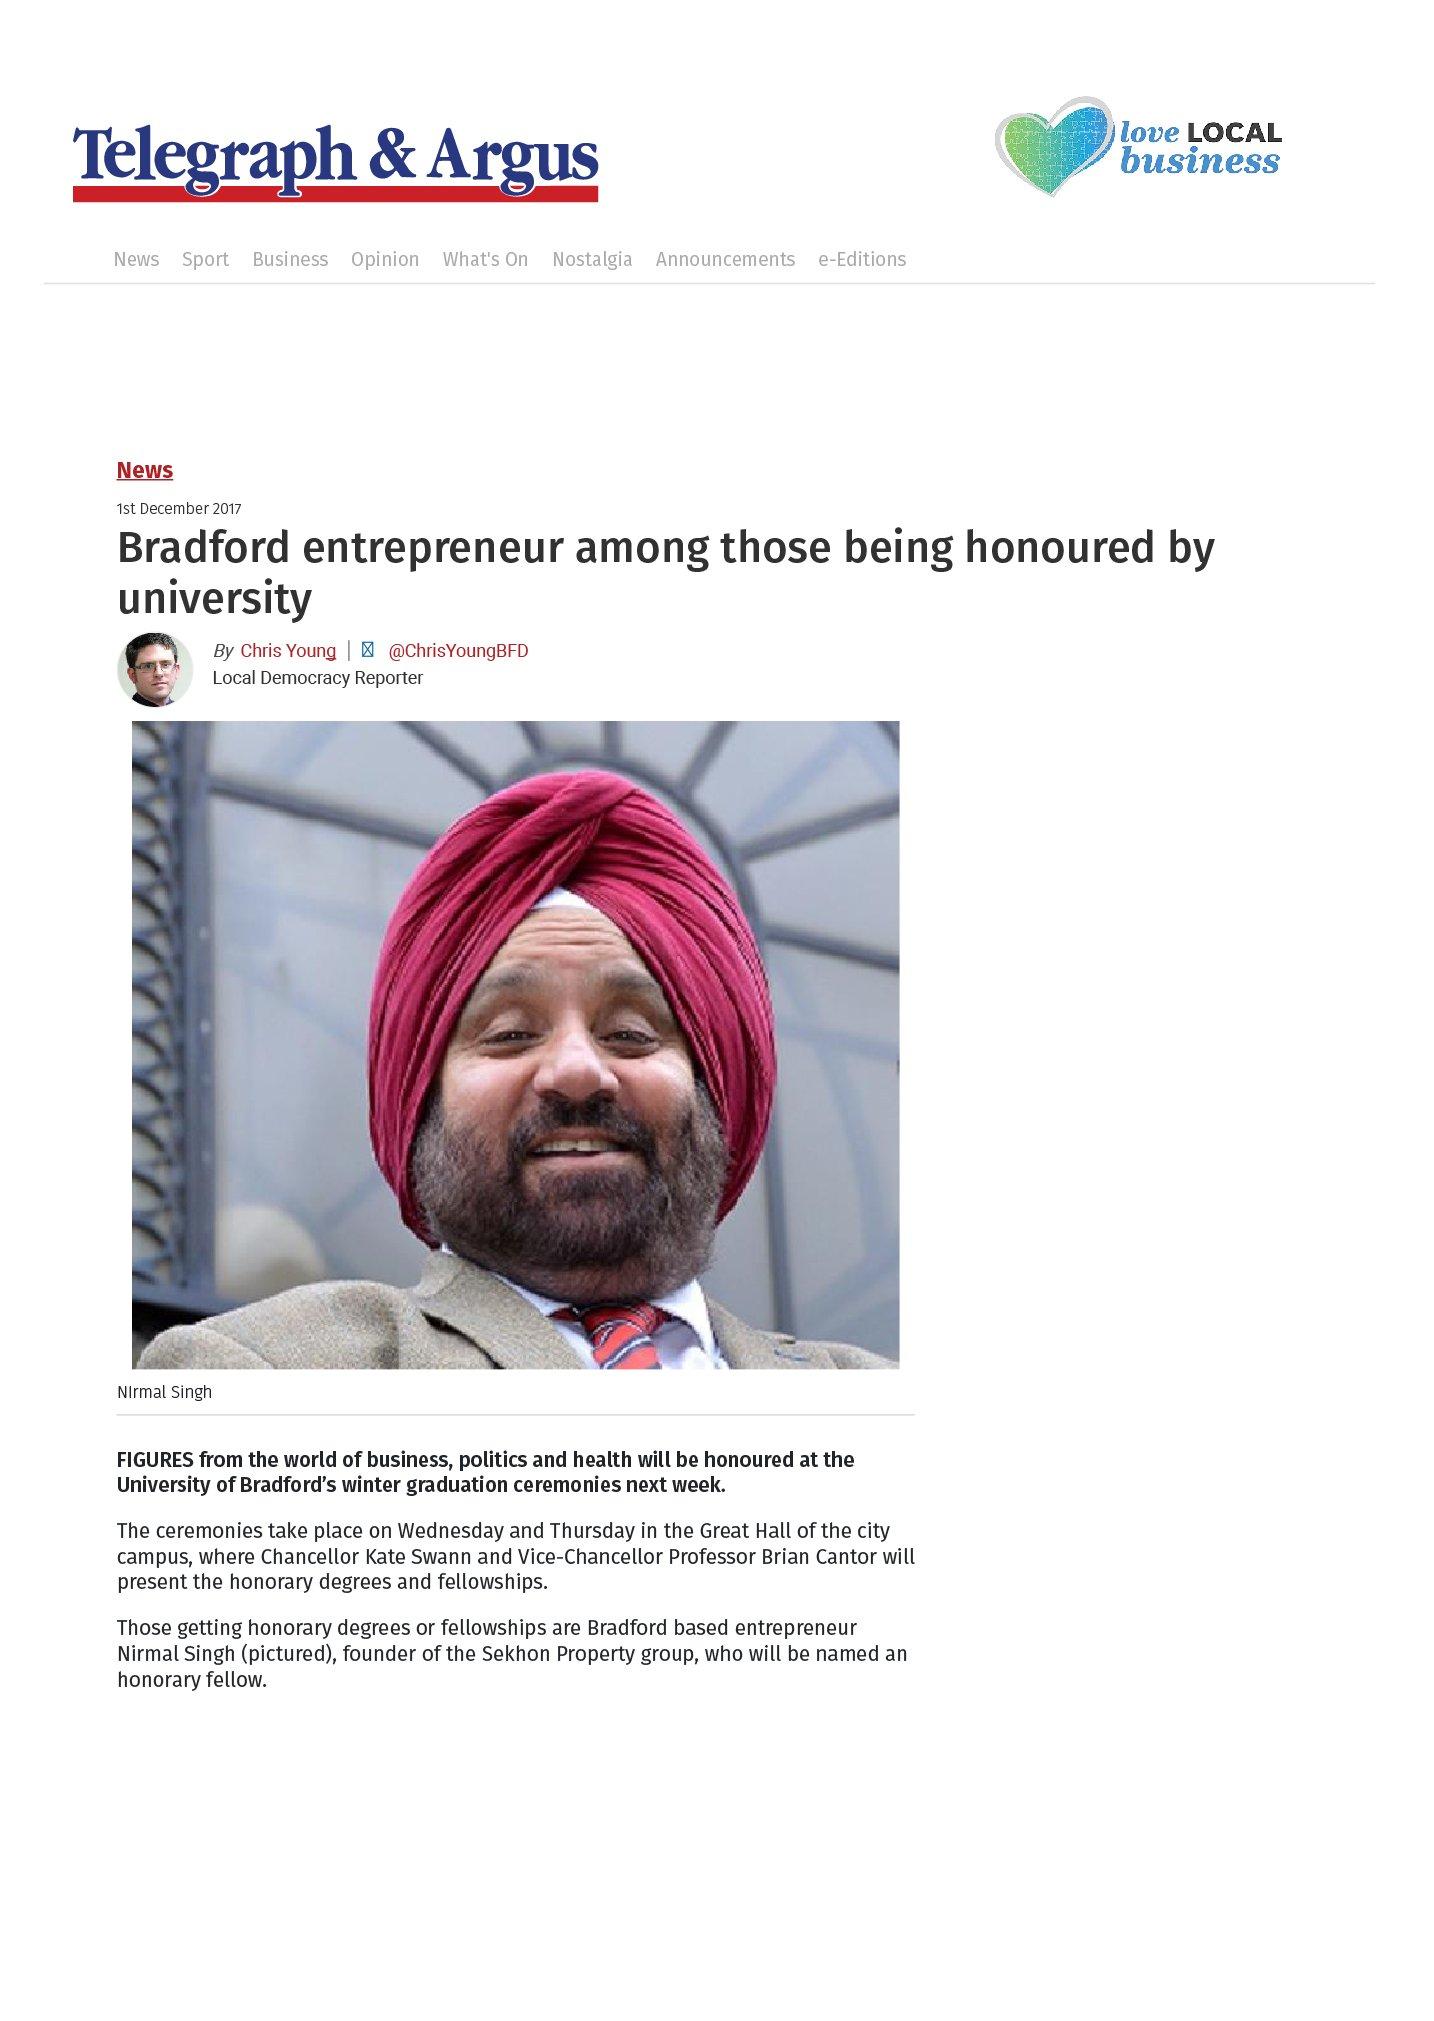 Bradford entrepreneur among those being honoured by university